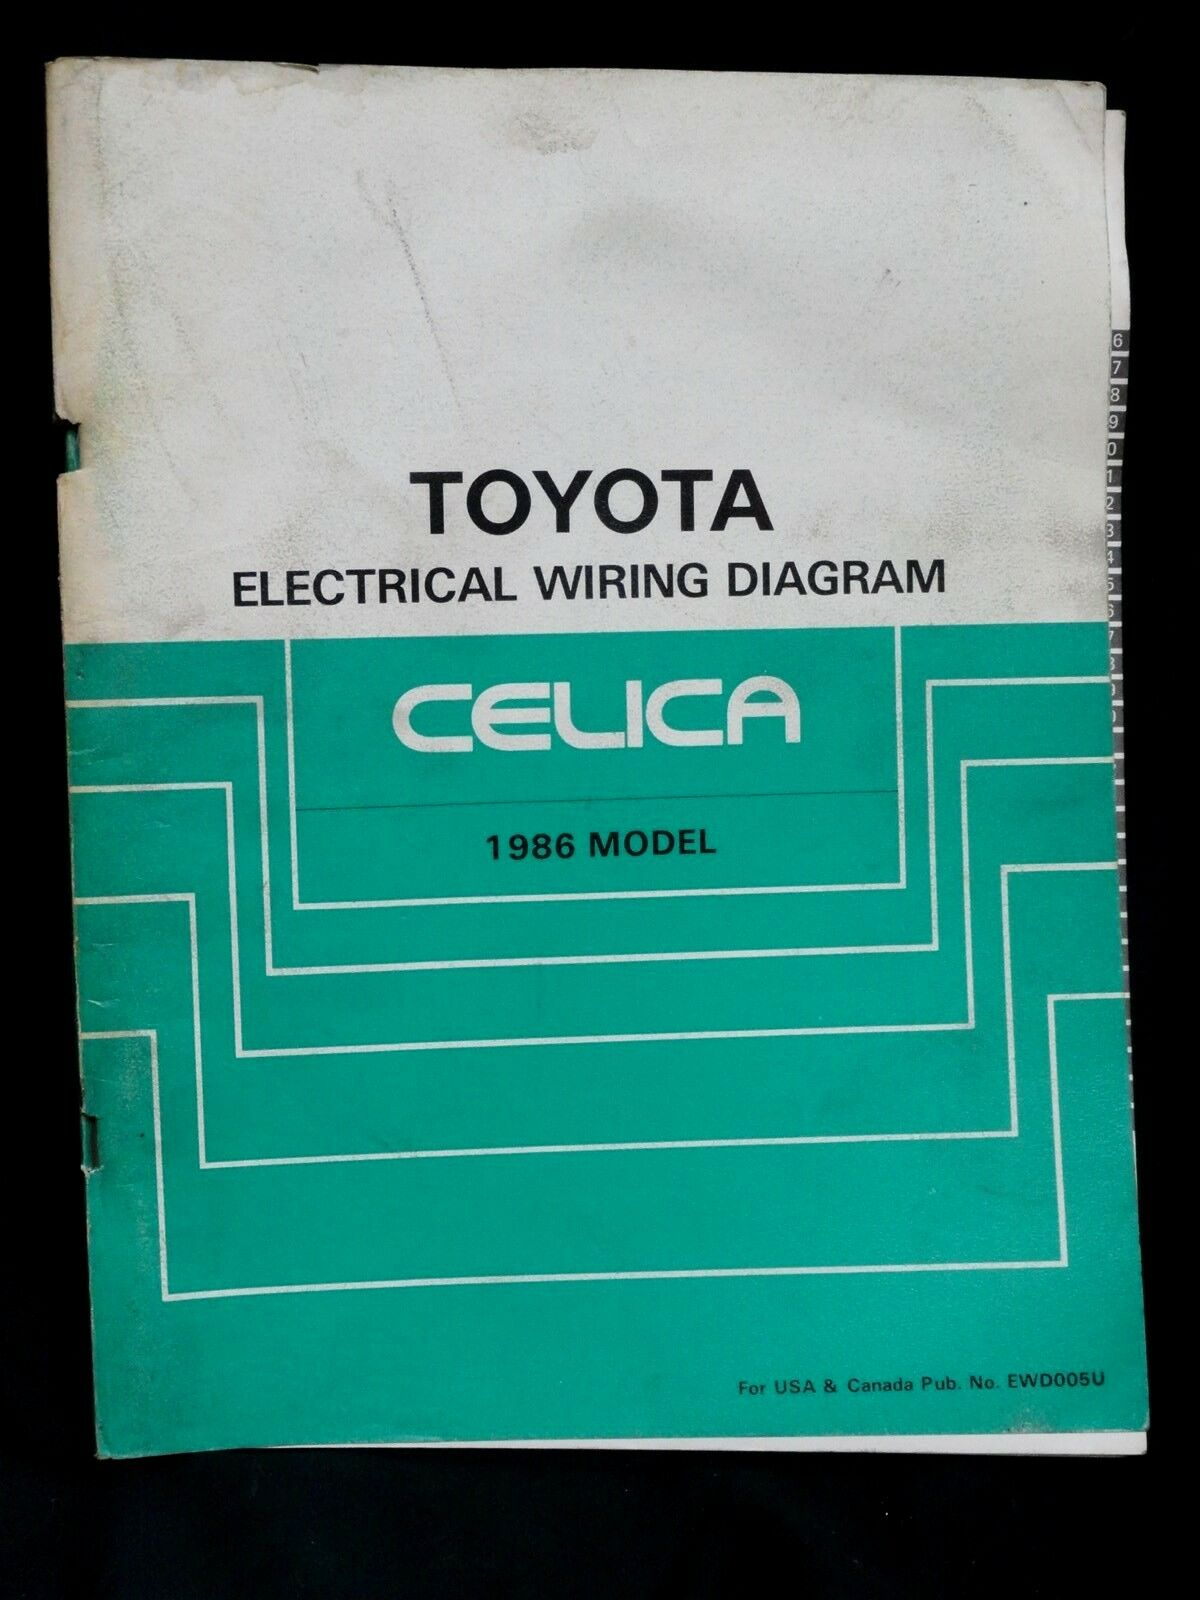 1986 * TOYOTA CELICA * OEM FACTORY DEALERSHIP * ELECTRICAL WIRING DIAGRAM MANUAL